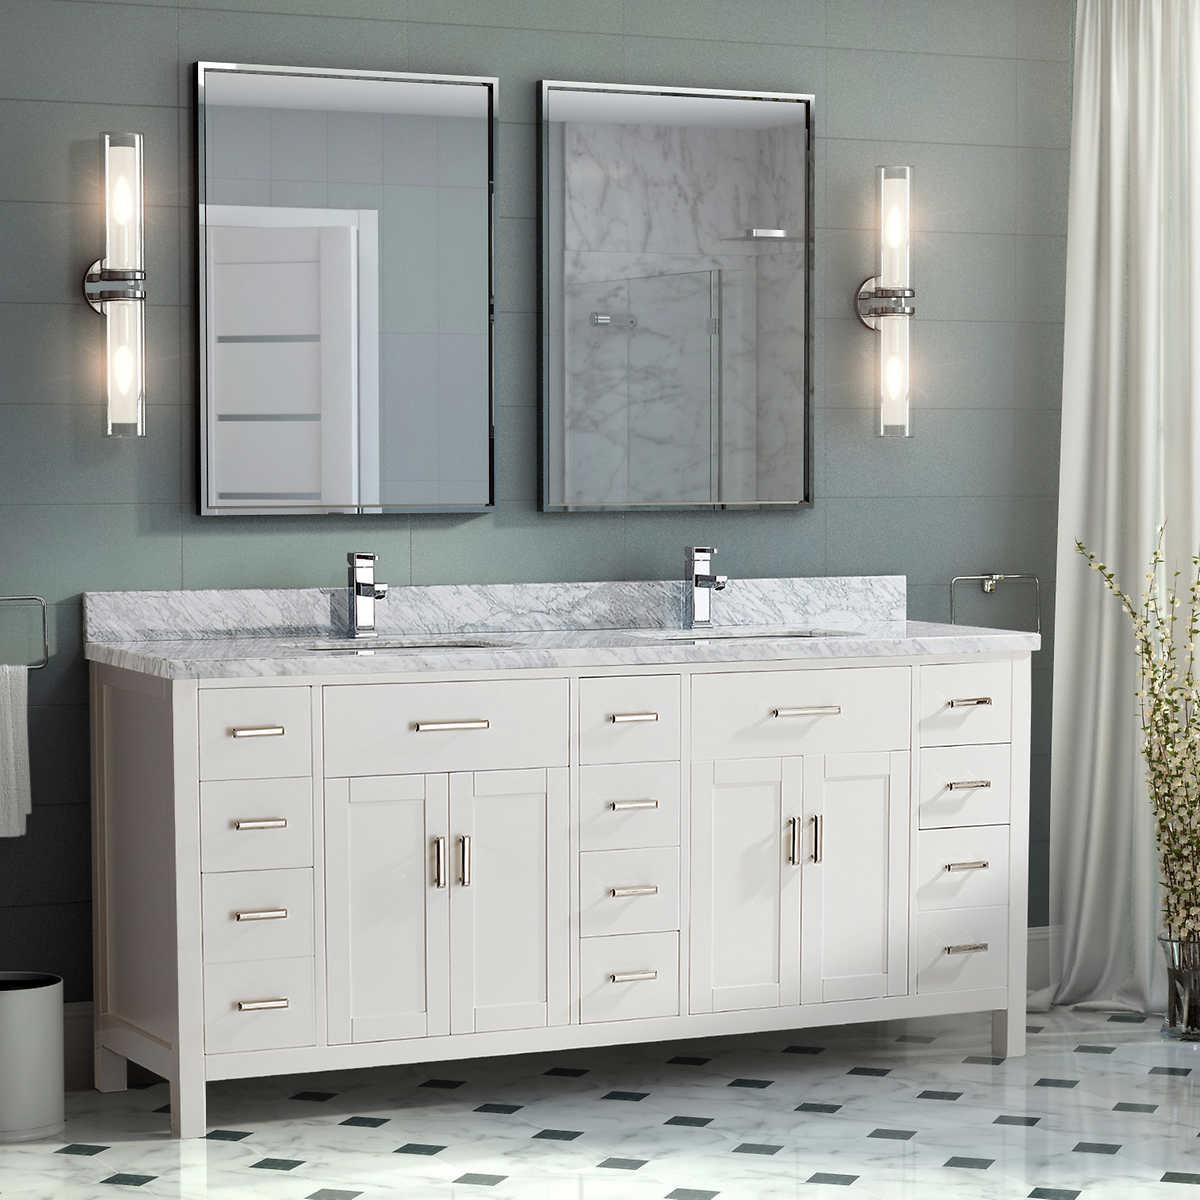 Source Bathroom Lowes Small Bathroom Vanity Costco Vanity Double Sink Vanities For Small